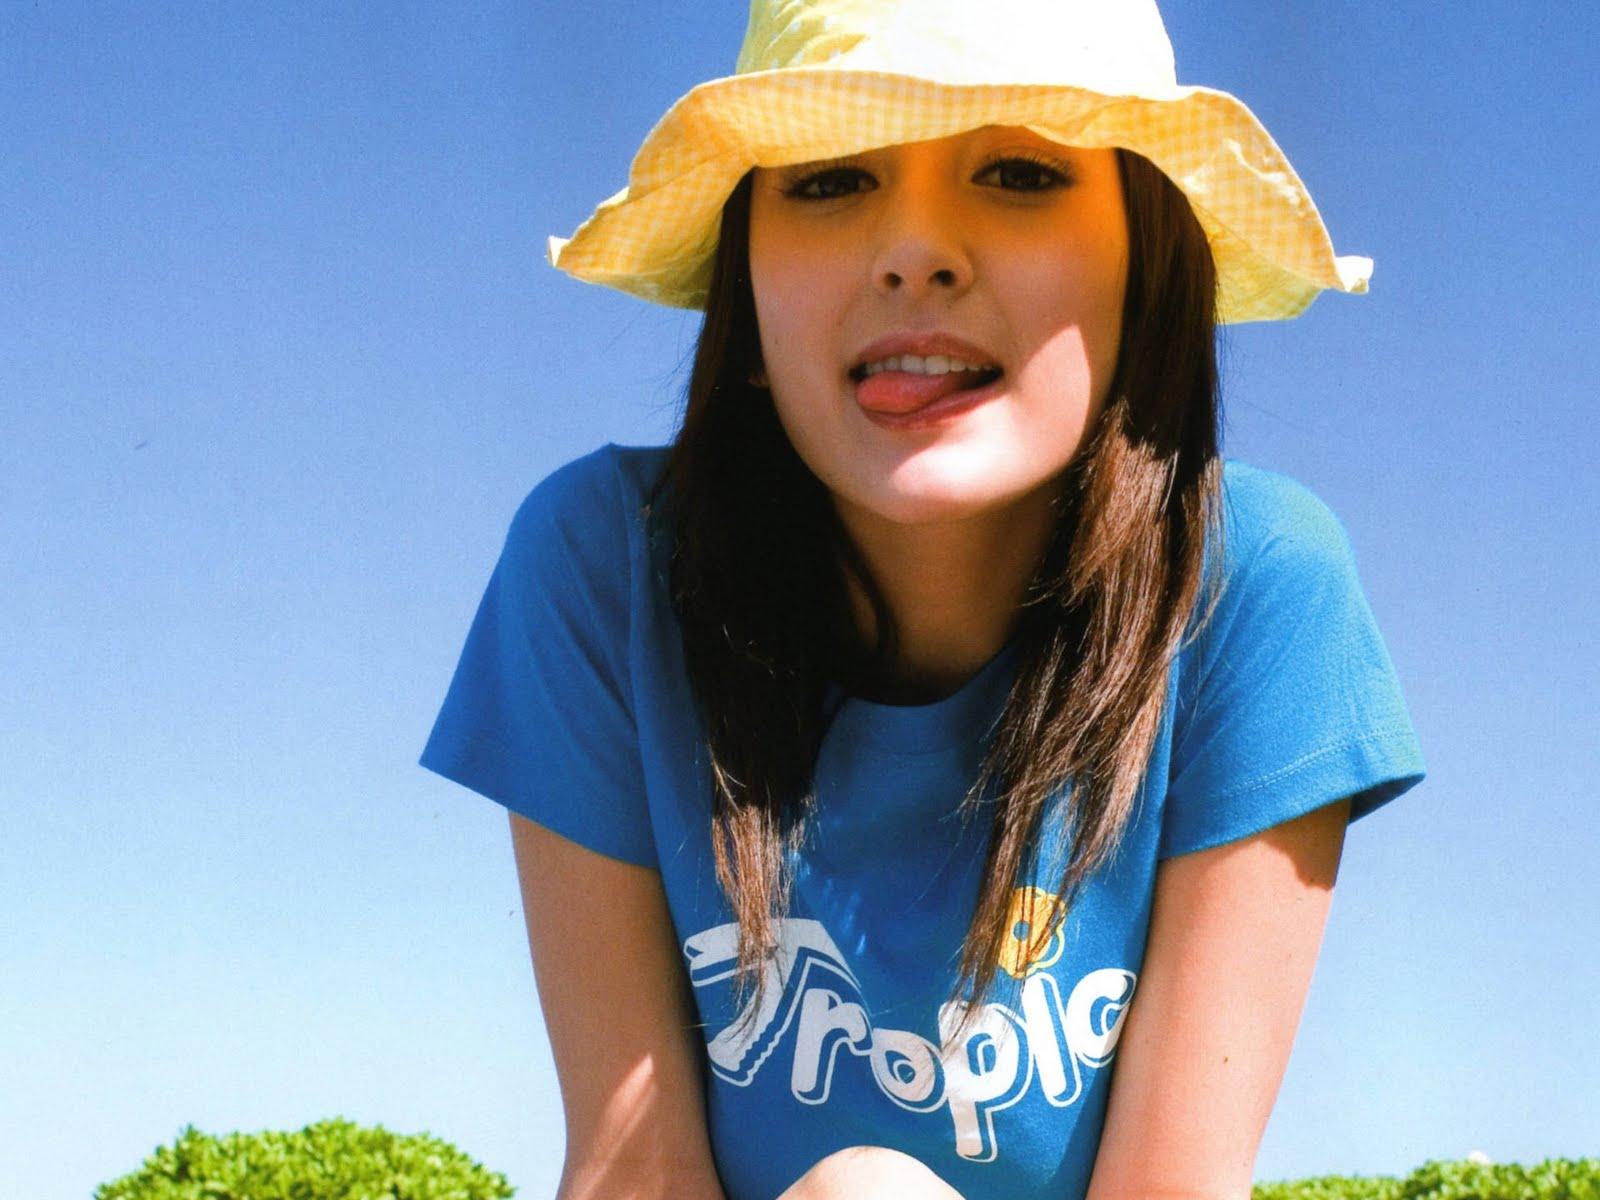 Foto Grafia Livia: American-born Japanese Singer And Model